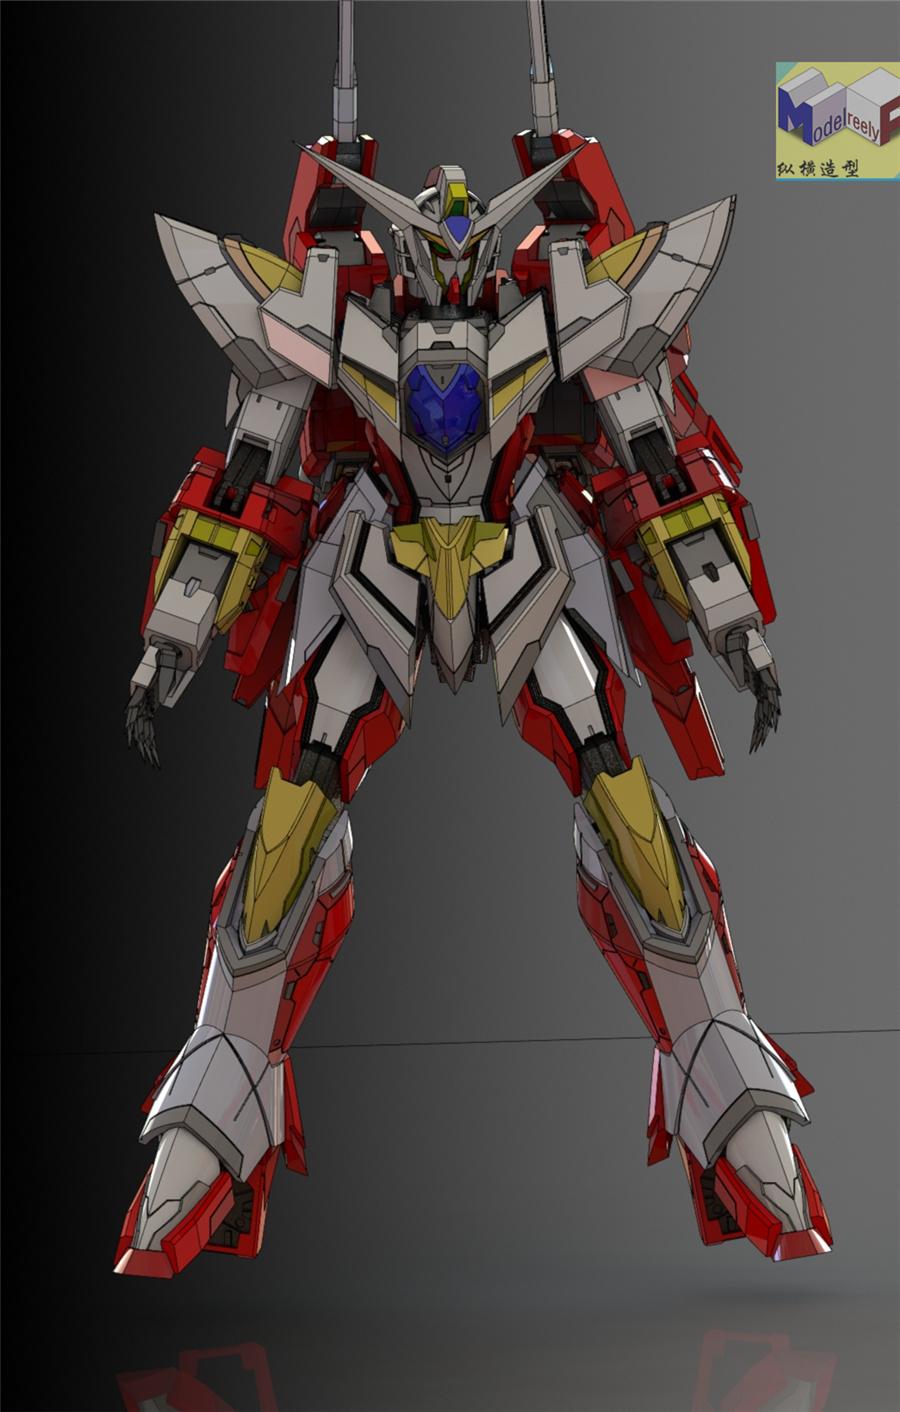 G152_Ribonzu_mg_info_inask_037.jpg